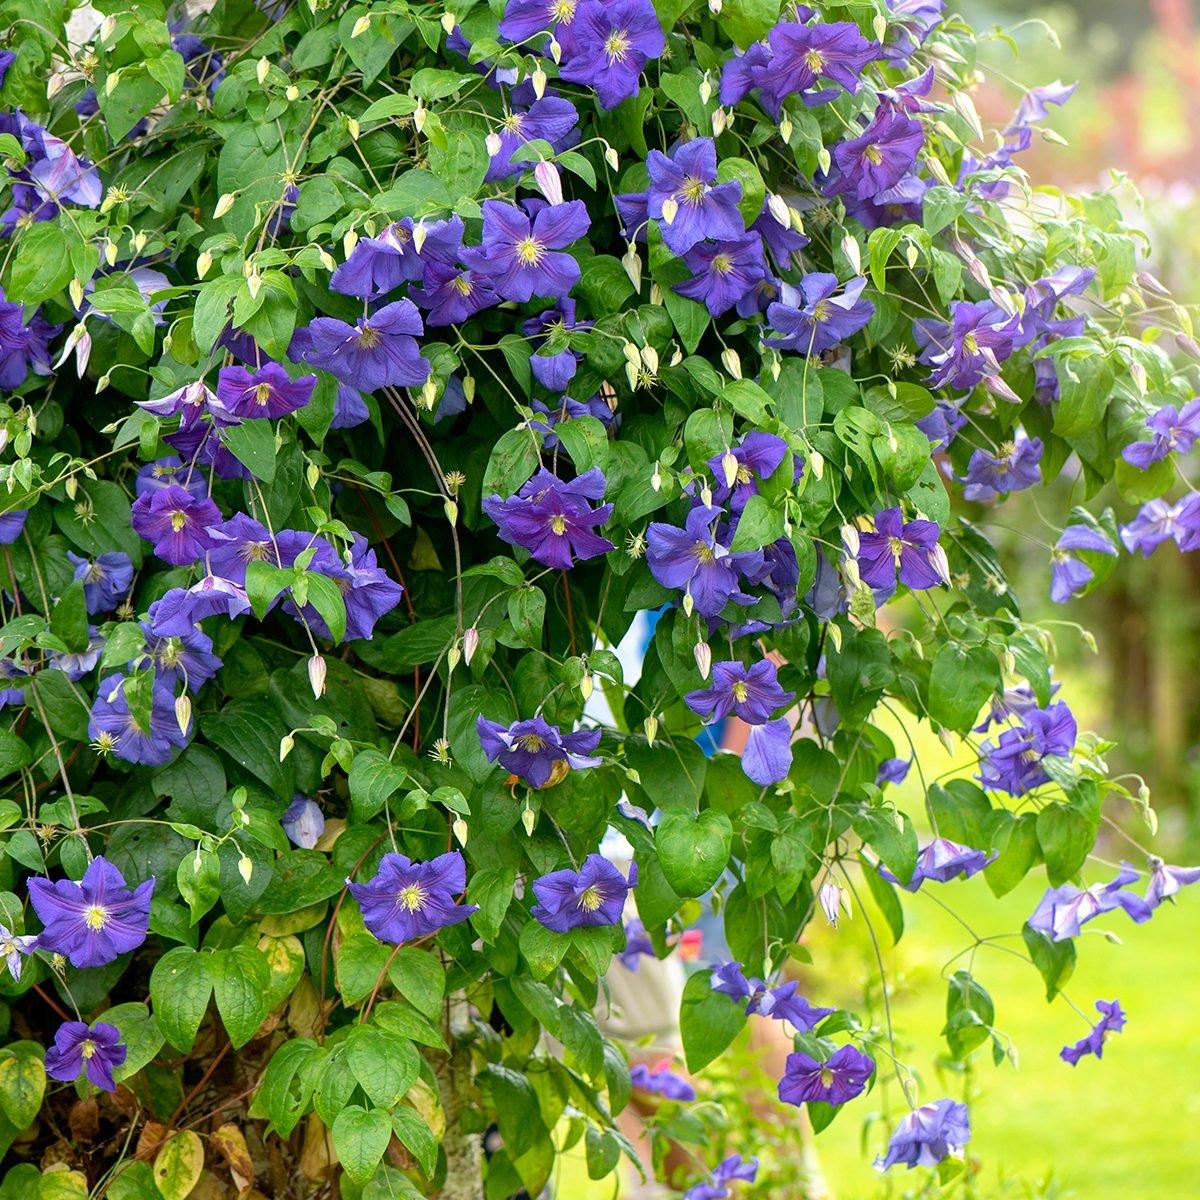 Close-up of the beautiful vibrant purple summer flowers of Clematis Jackmanii purpurea climbing up a garden tree